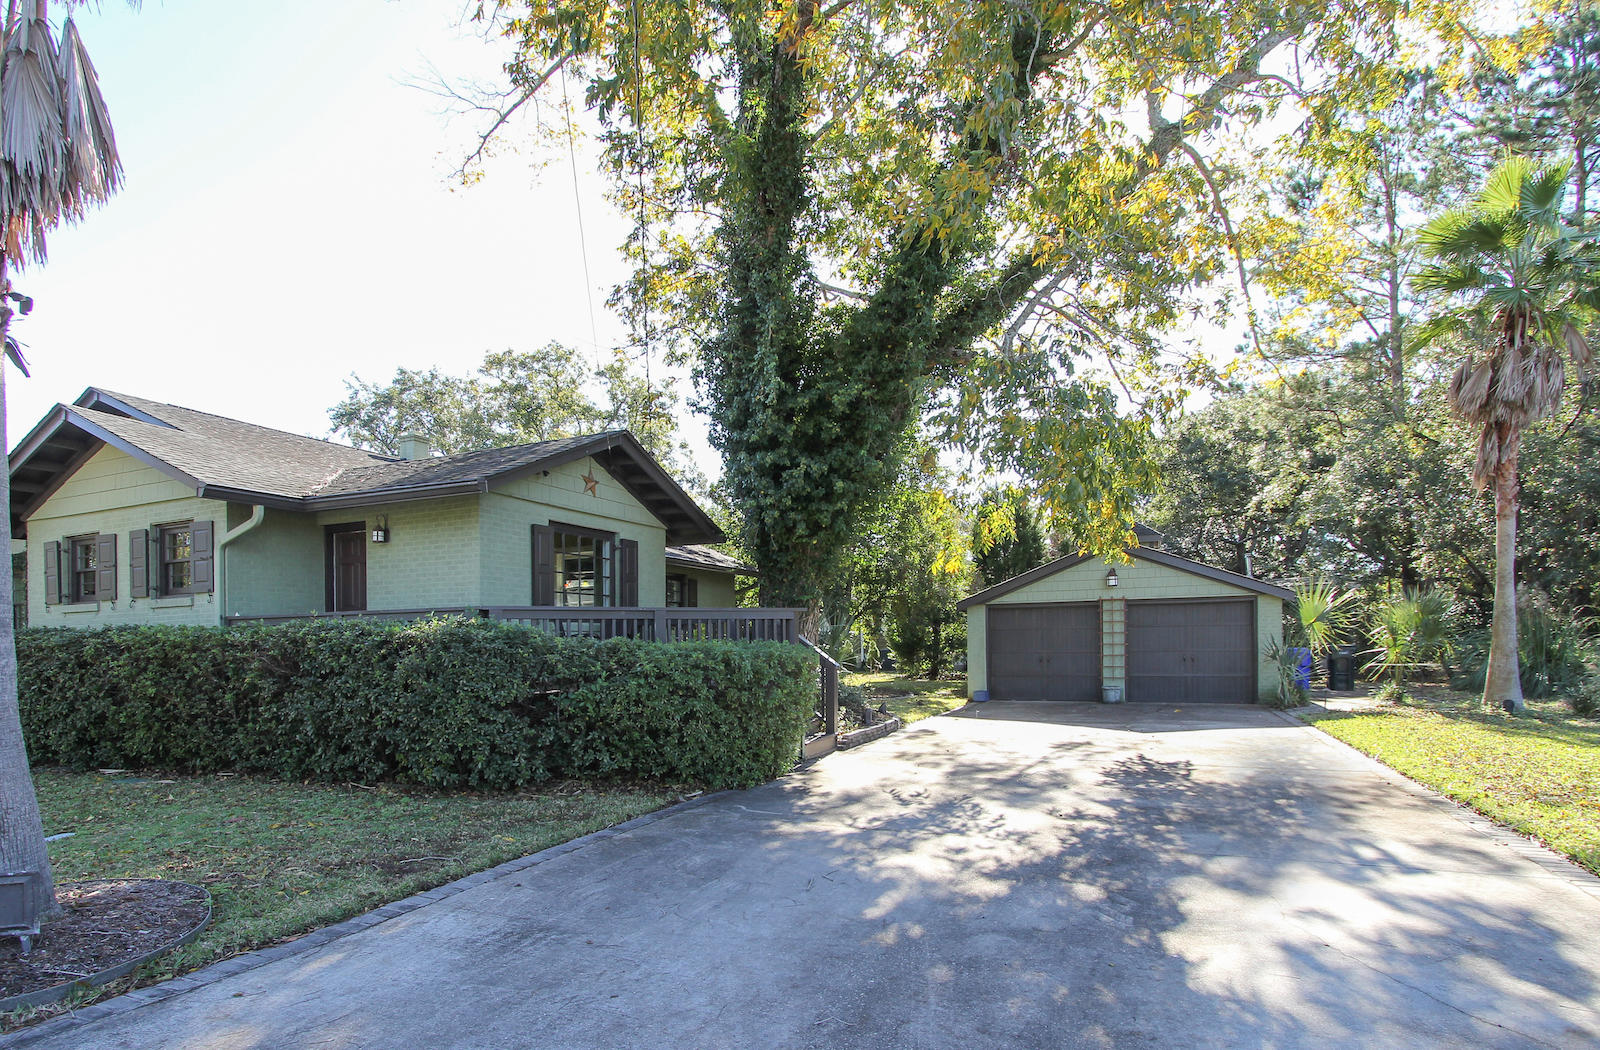 Albemarle Point Homes For Sale - 3 Albemarle, Charleston, SC - 30